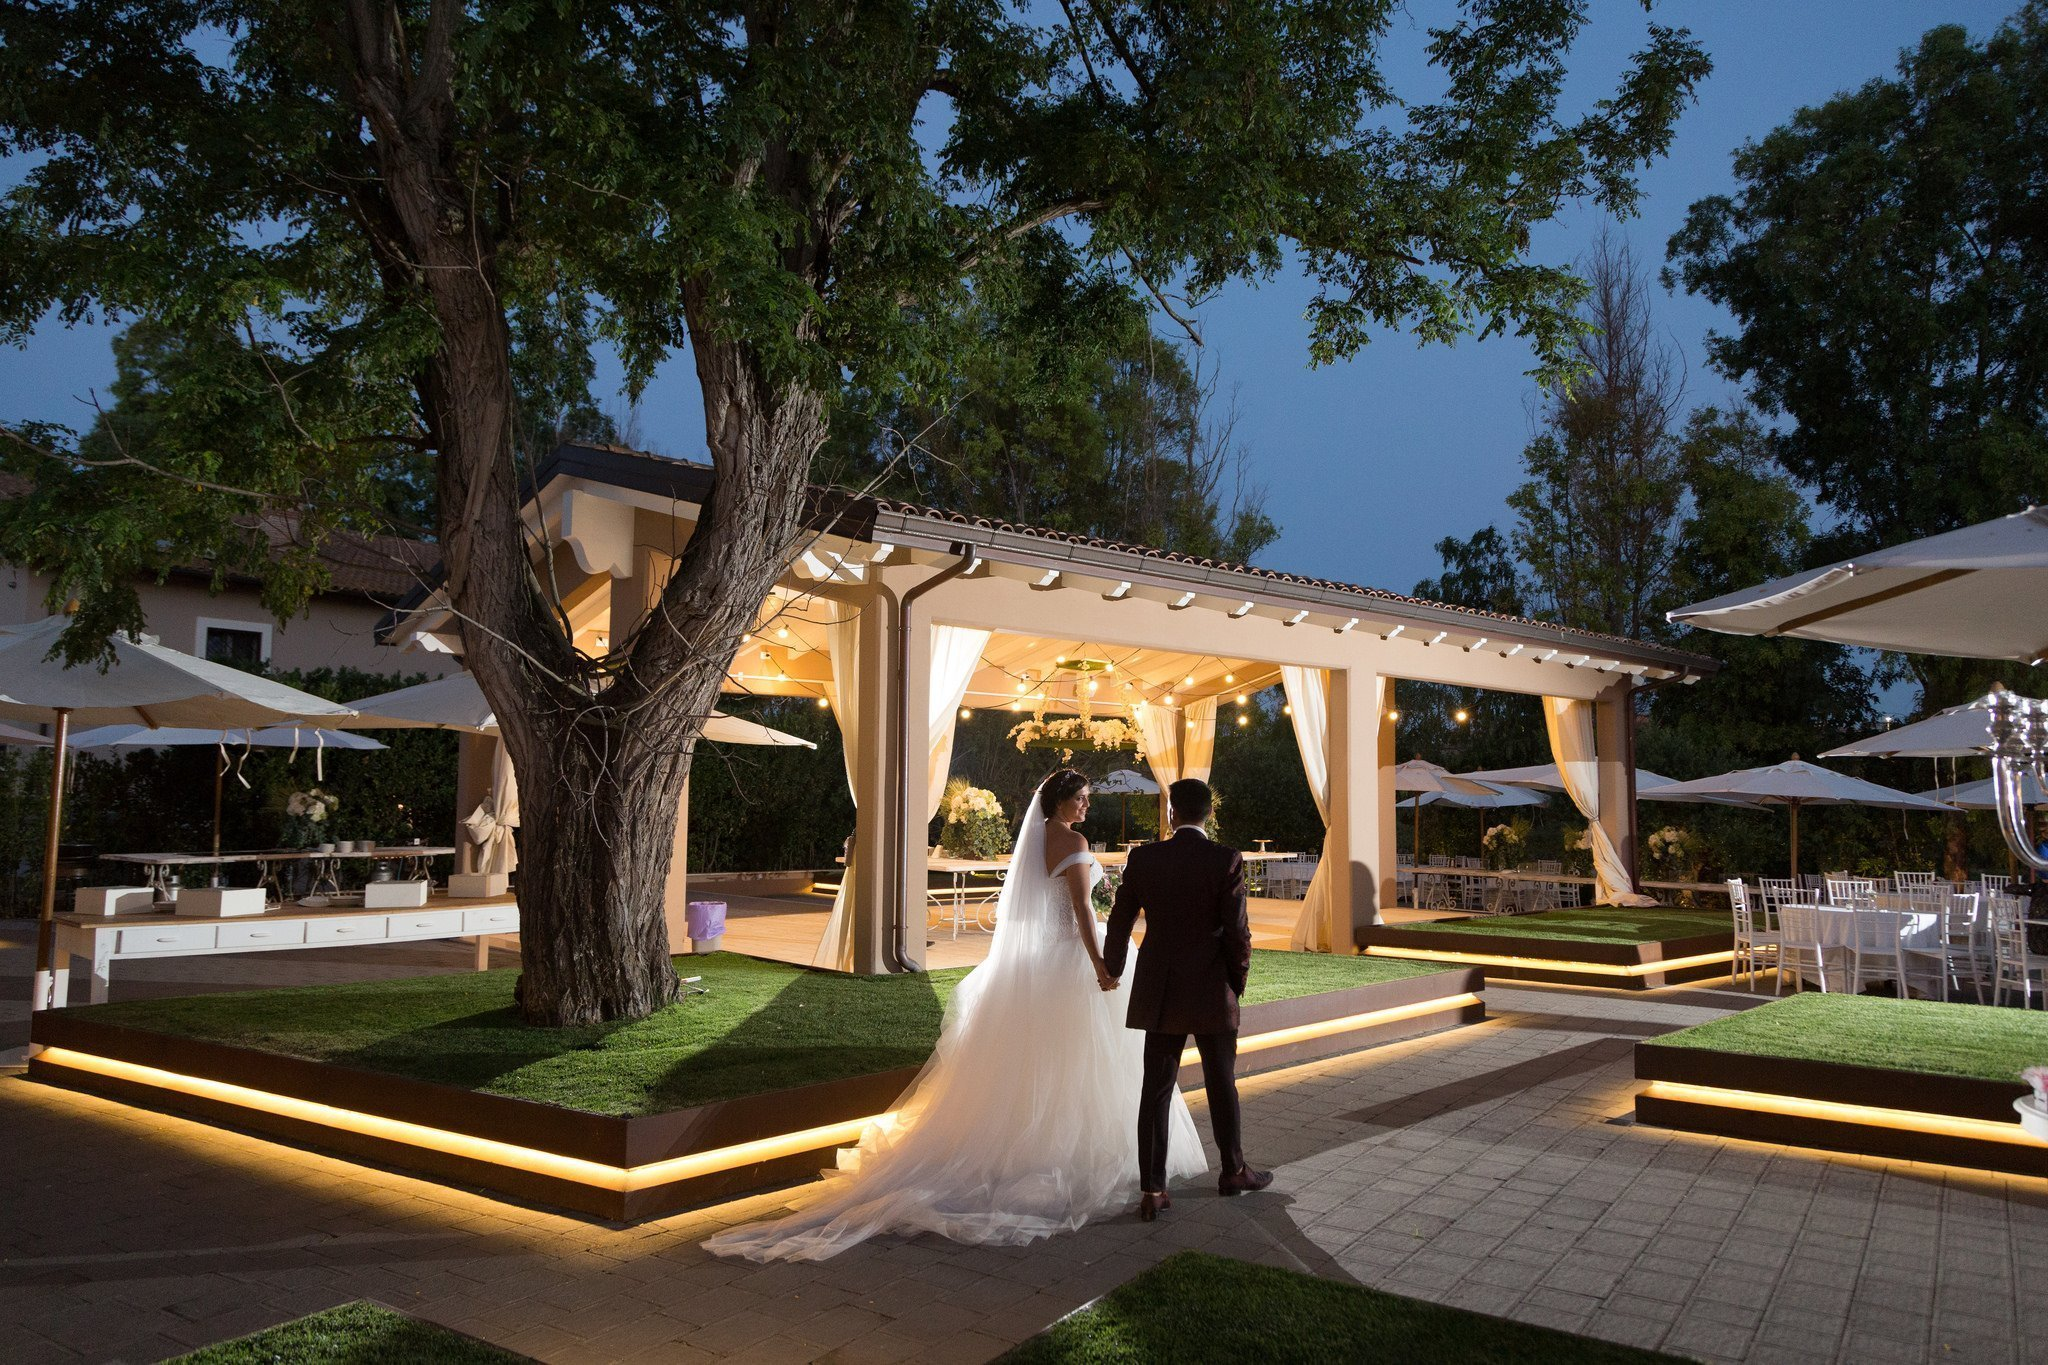 Matrimonio in Villa le Jarden Potager